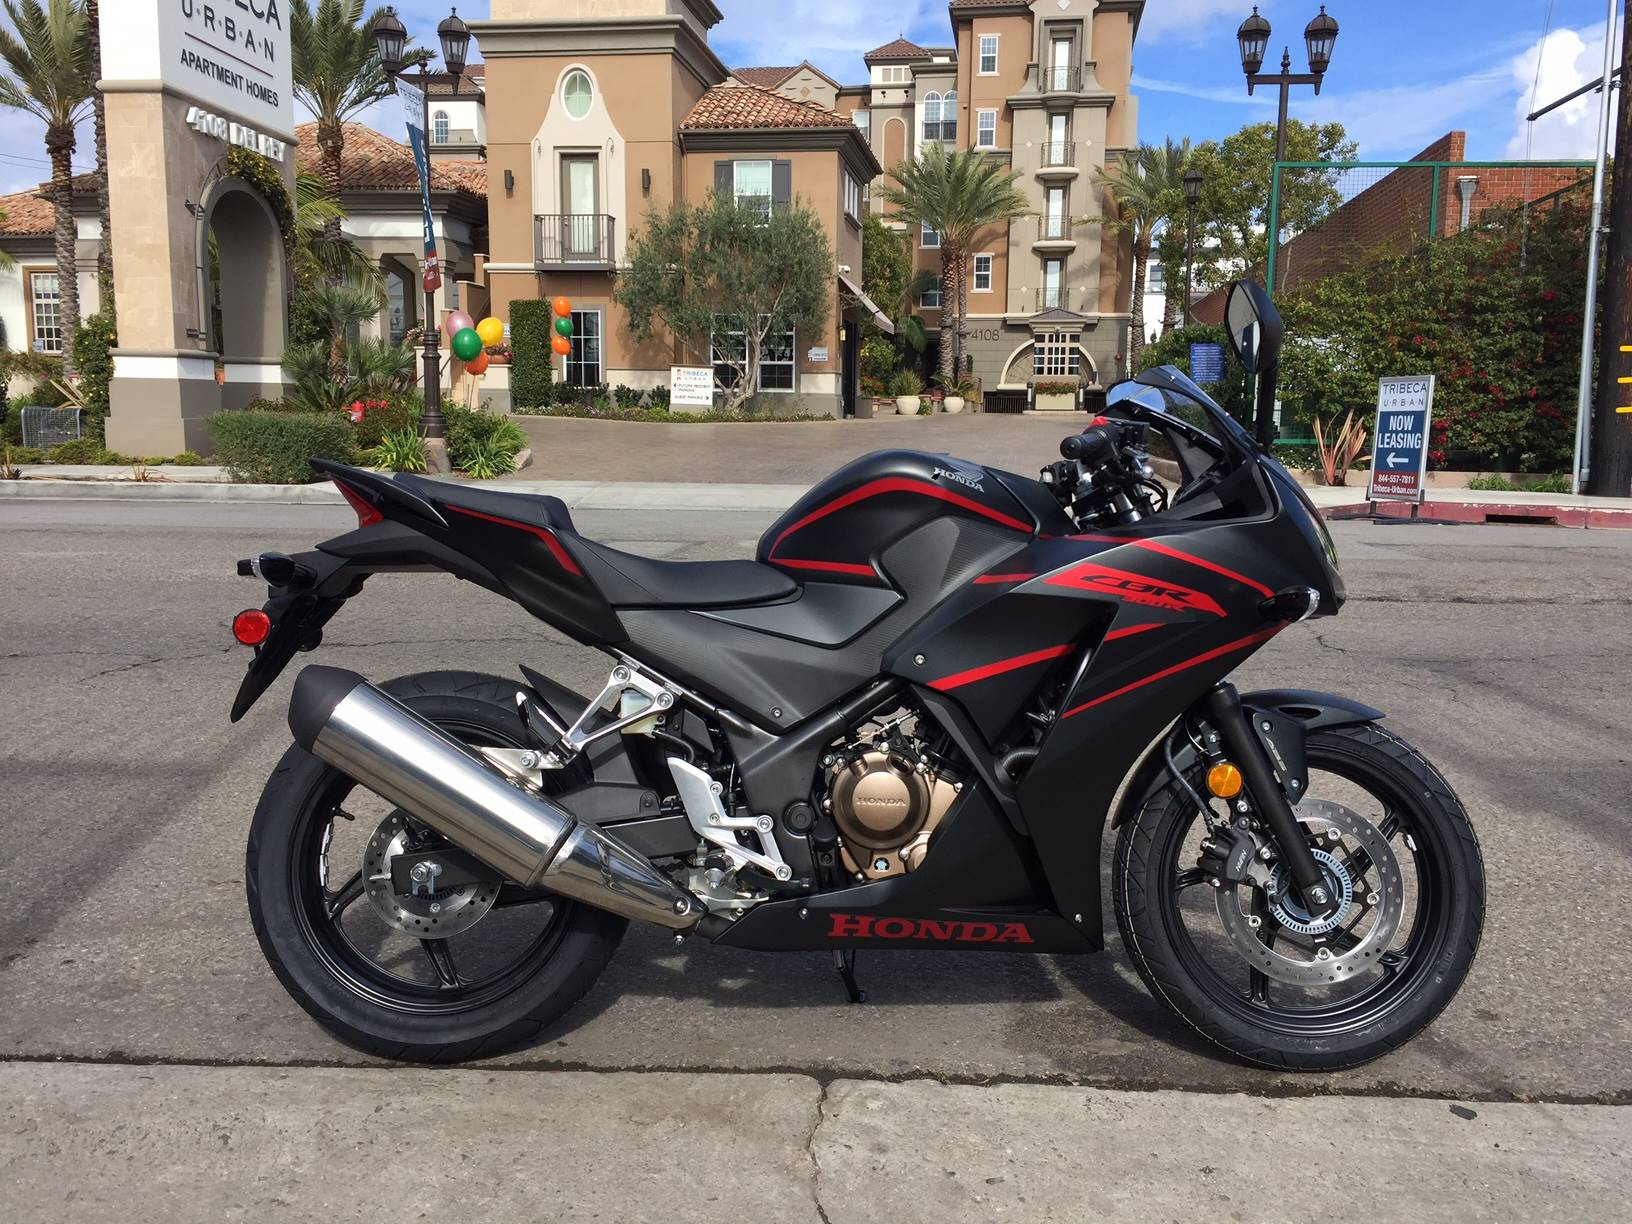 2018 honda cbr300r abs motorcycles marina del rey california